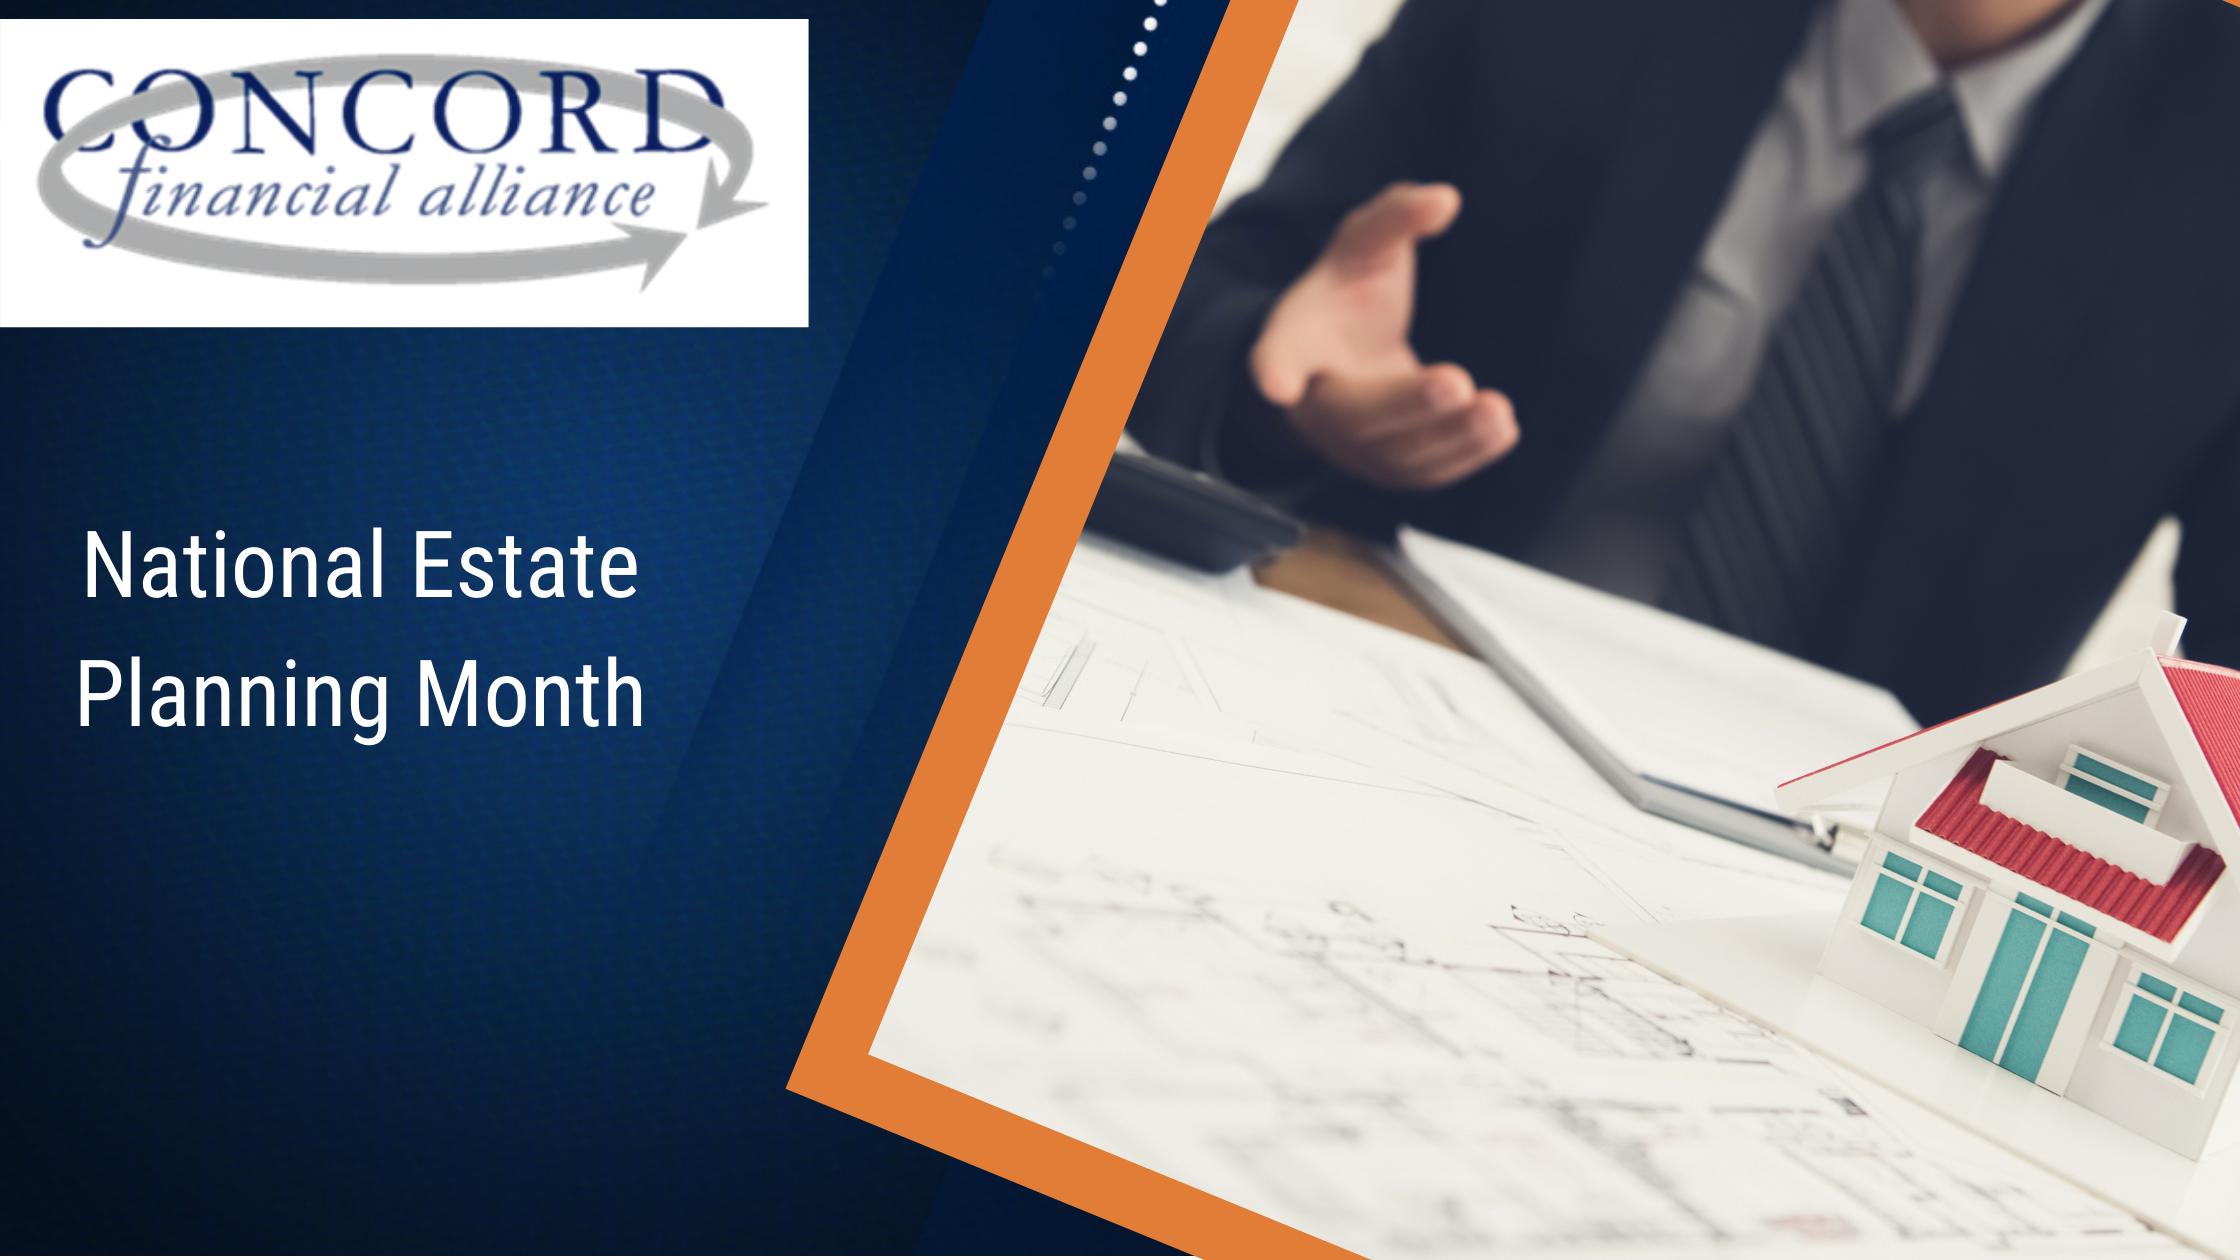 National Estate Planning Month